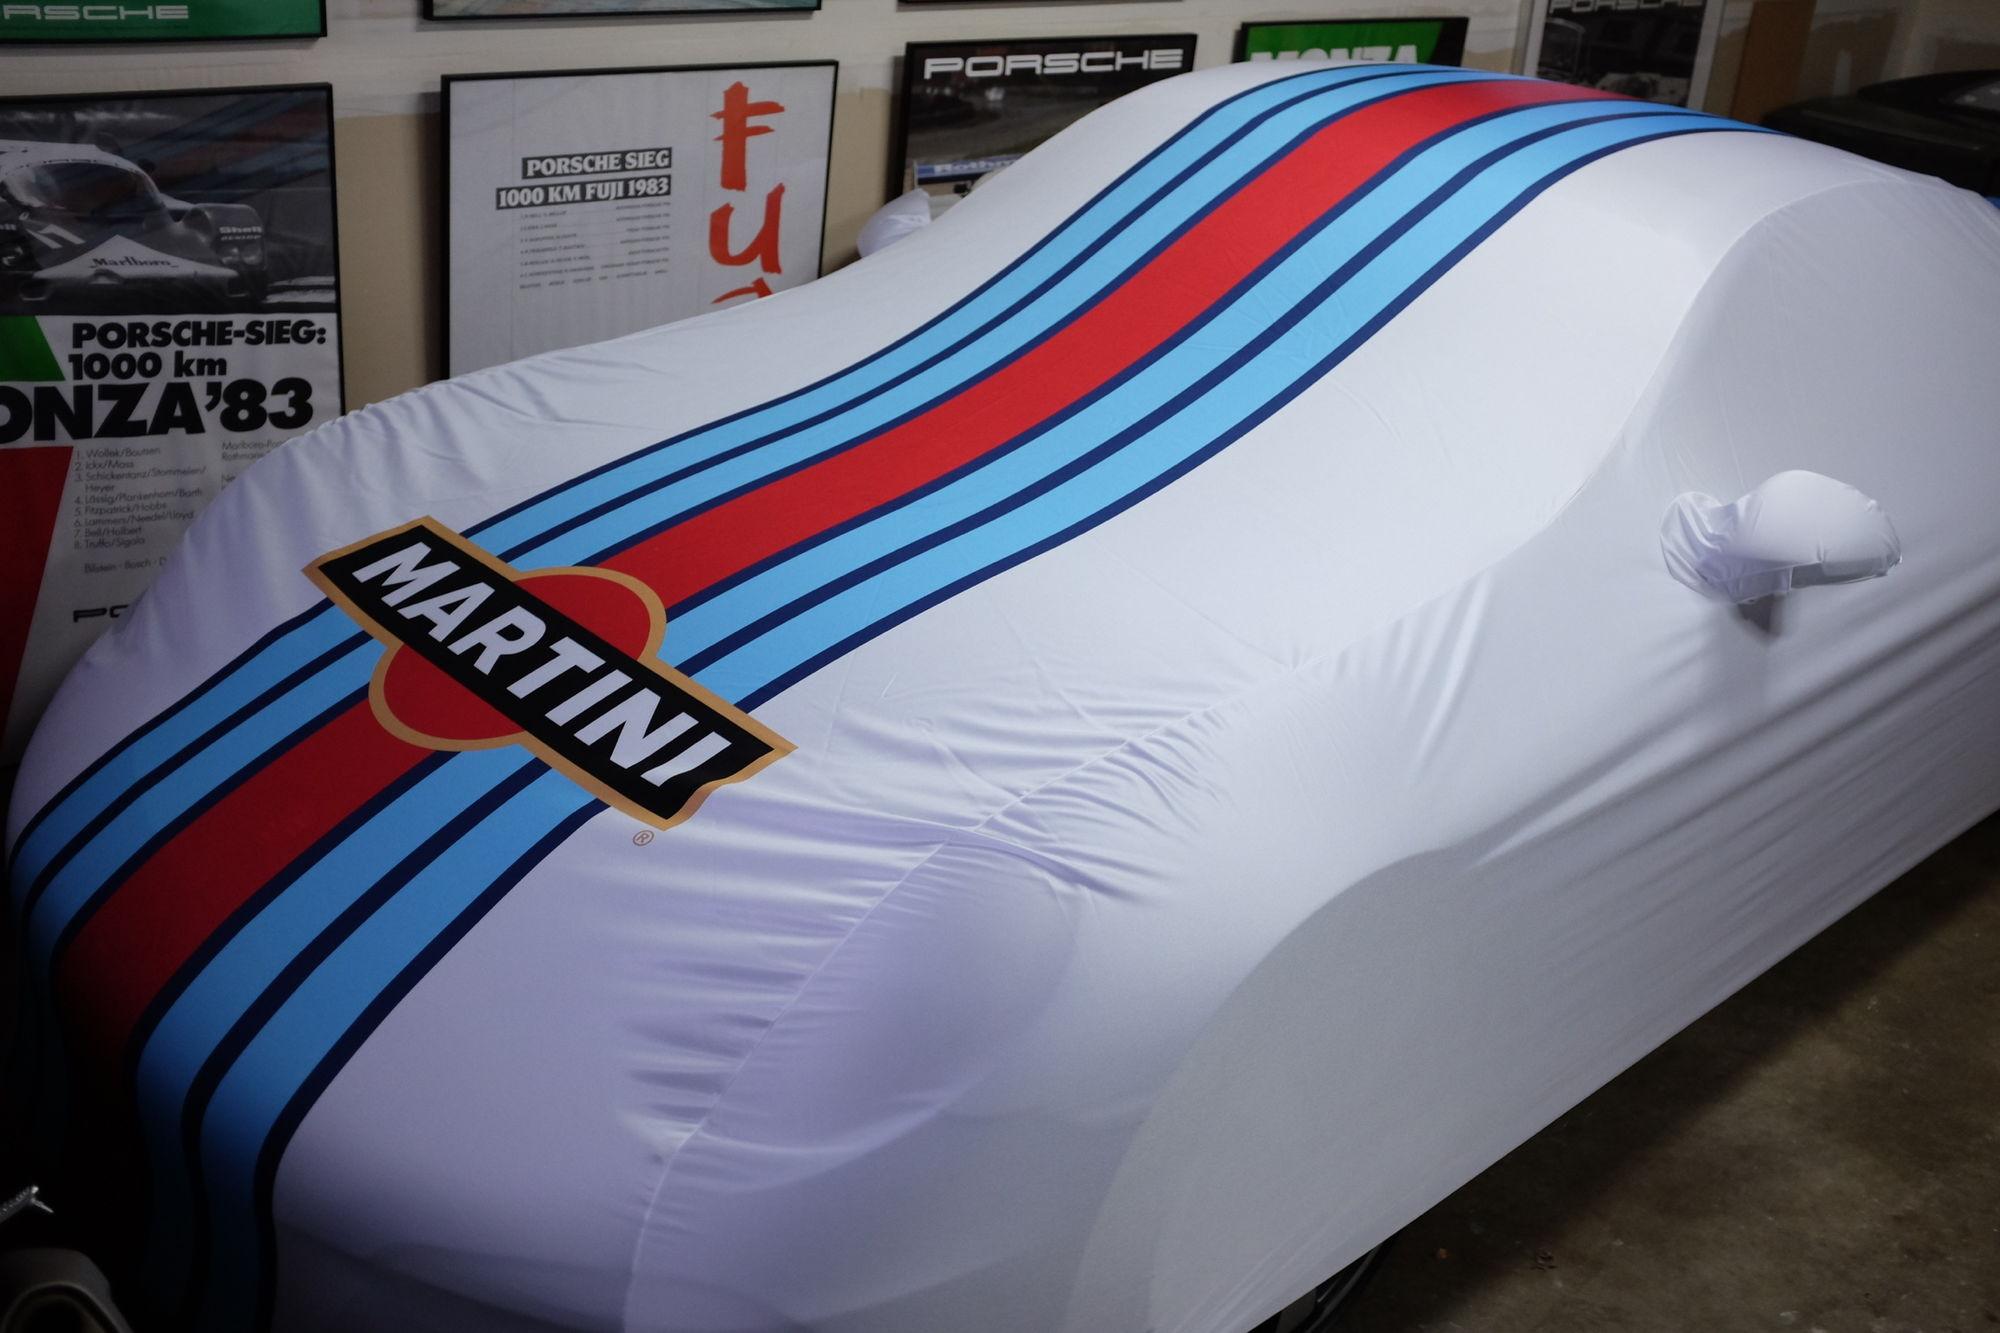 Porsche Car Cover: Porsche Genuine Indoor Car Cover Techequipment